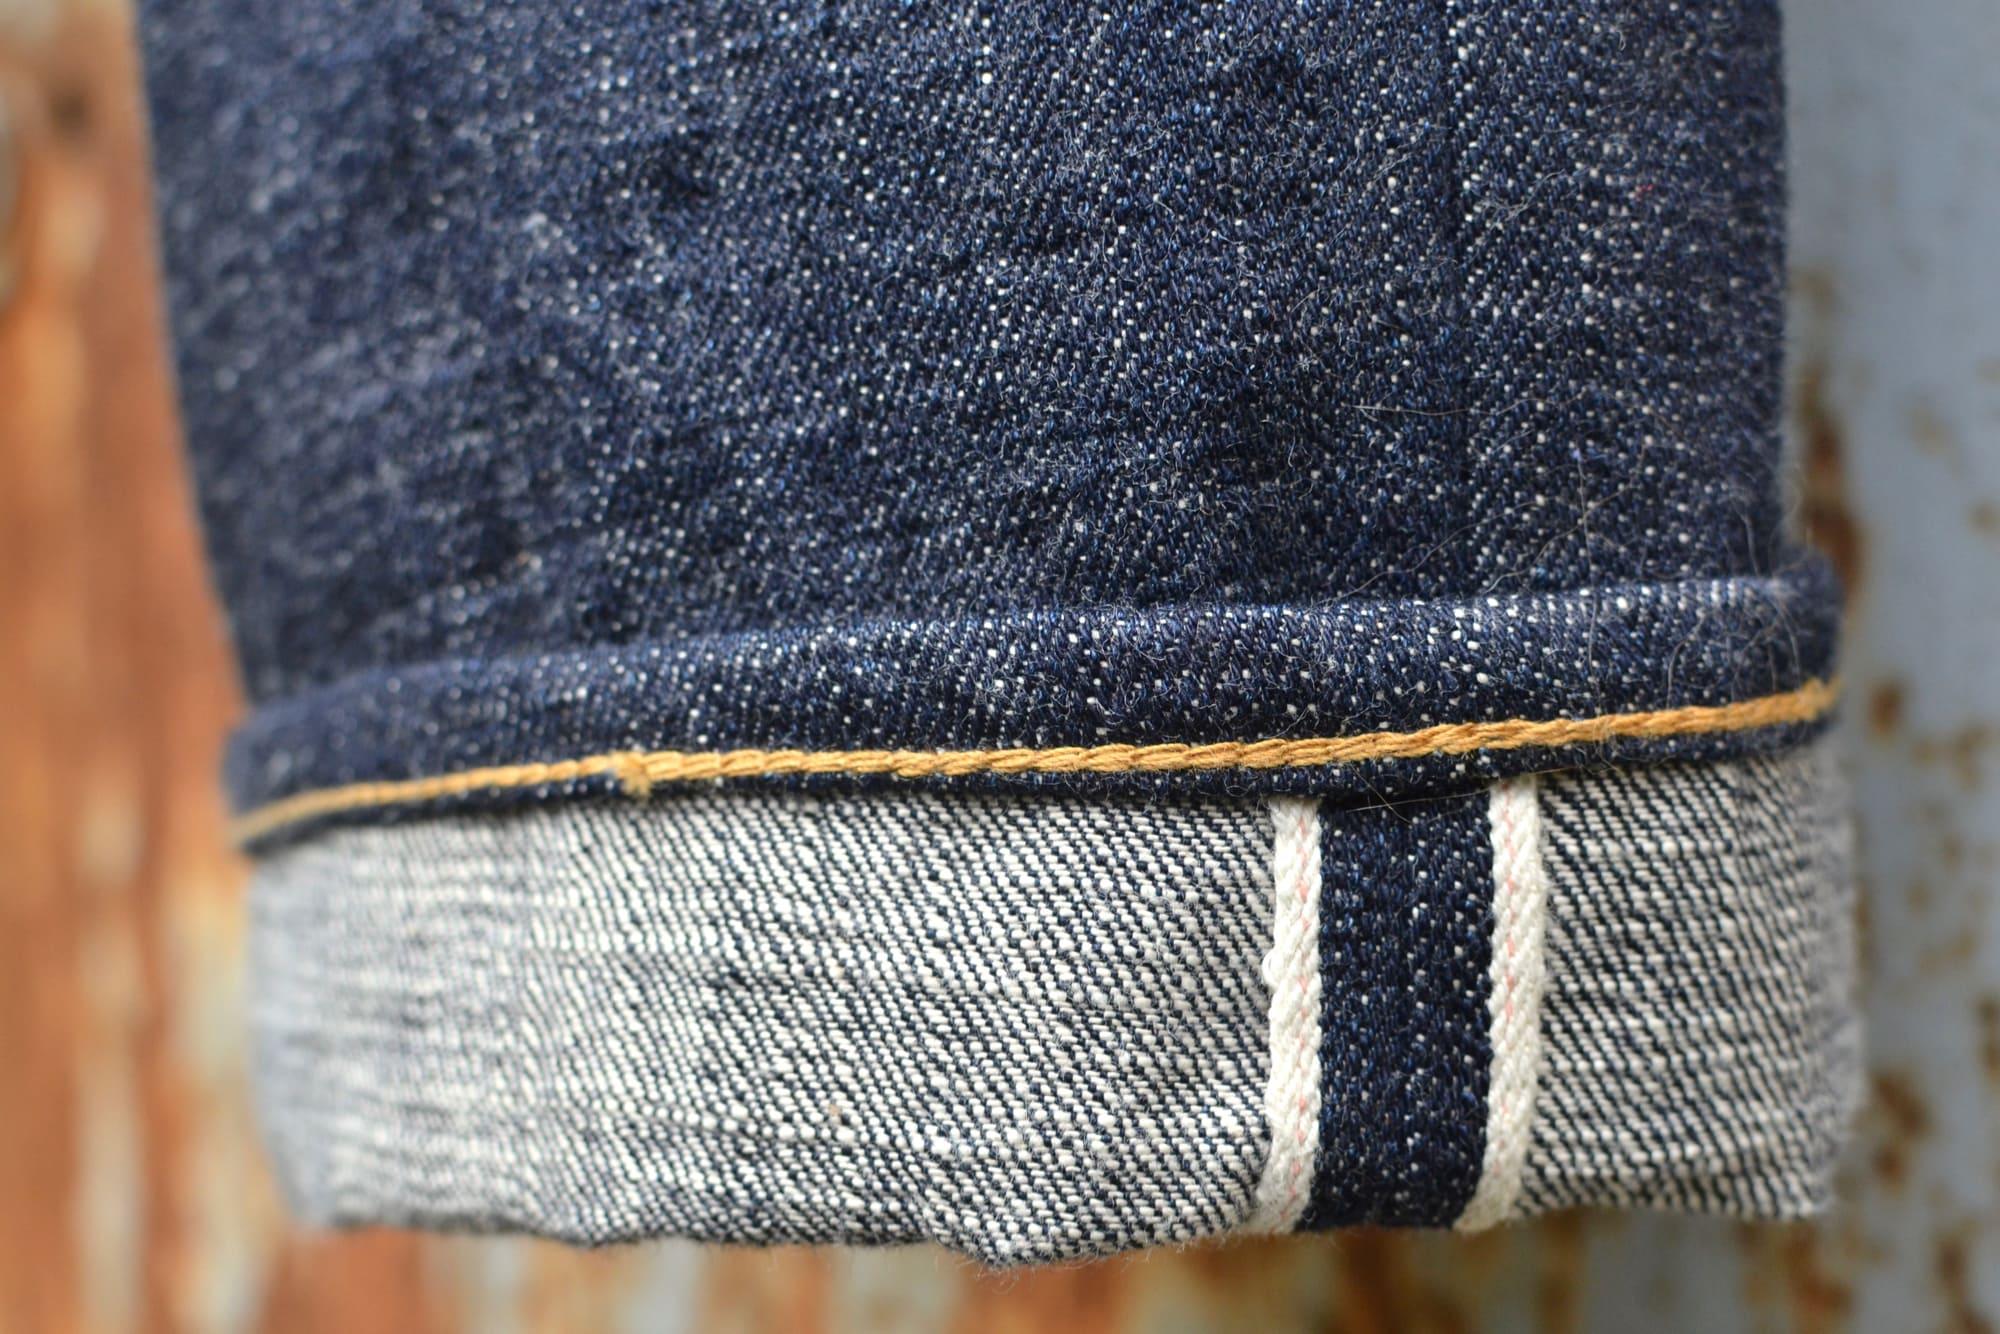 PHI DENIM PHI04 16oz jeans raw selvedge MADE IN JAPAN jeans Pocket made with kimono offcuts, Tsugihagi つぎはぎ